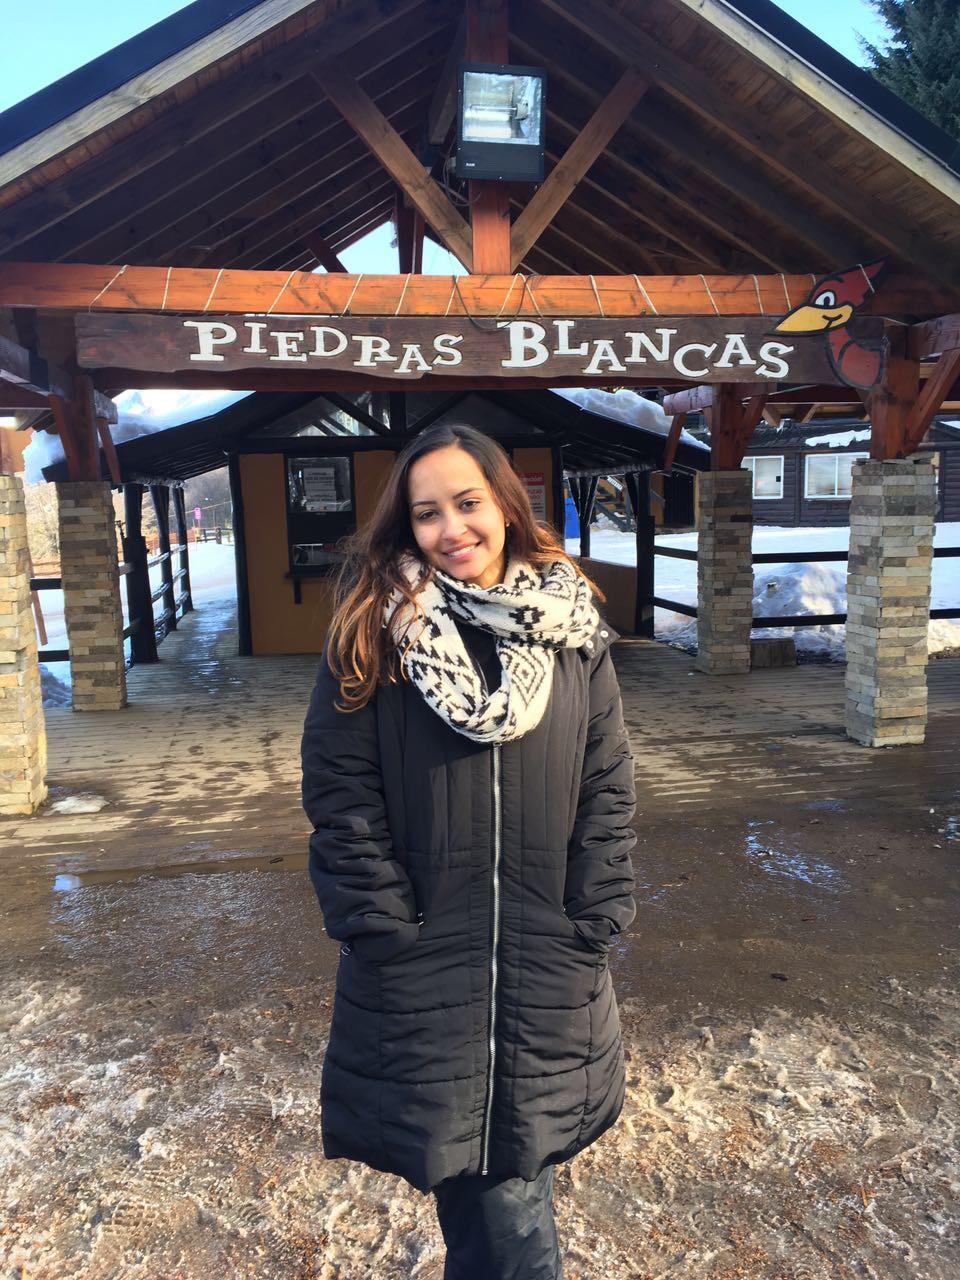 Viaje com Pouco - Piedras Blancas, Bariloche